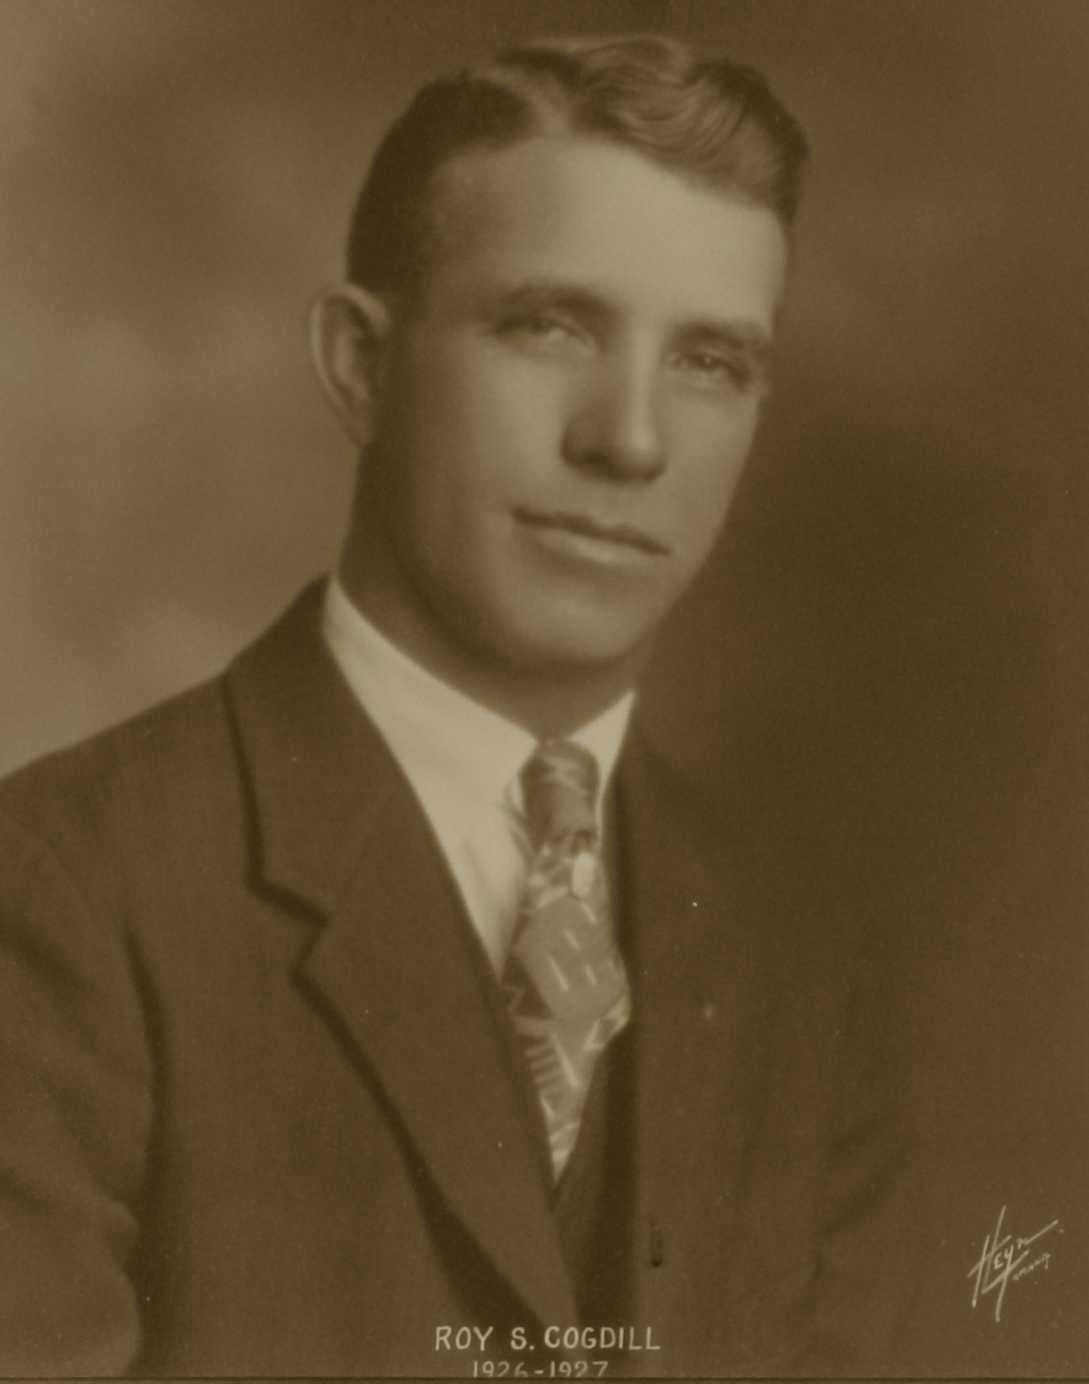 Roy Cogdill, 1926-1927